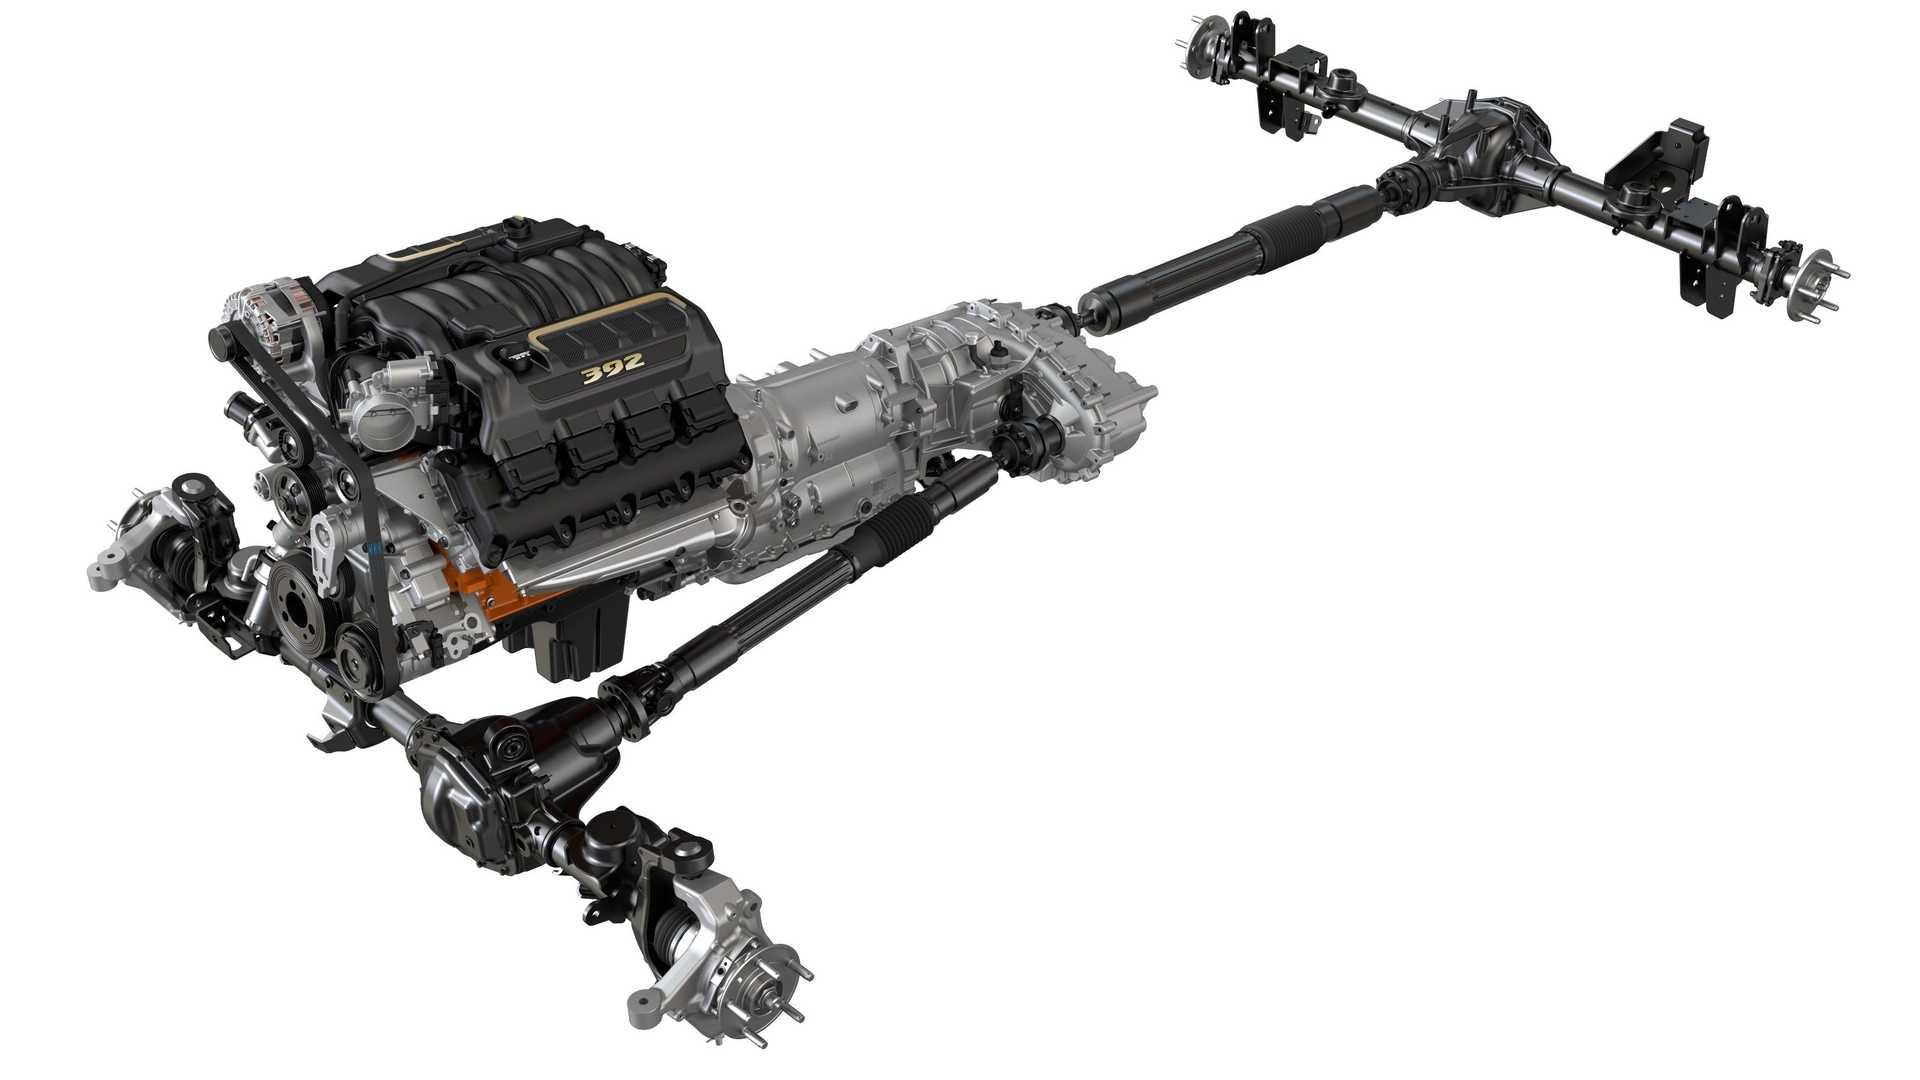 2021-jeep-wrangler-rubicon-392-powertrain